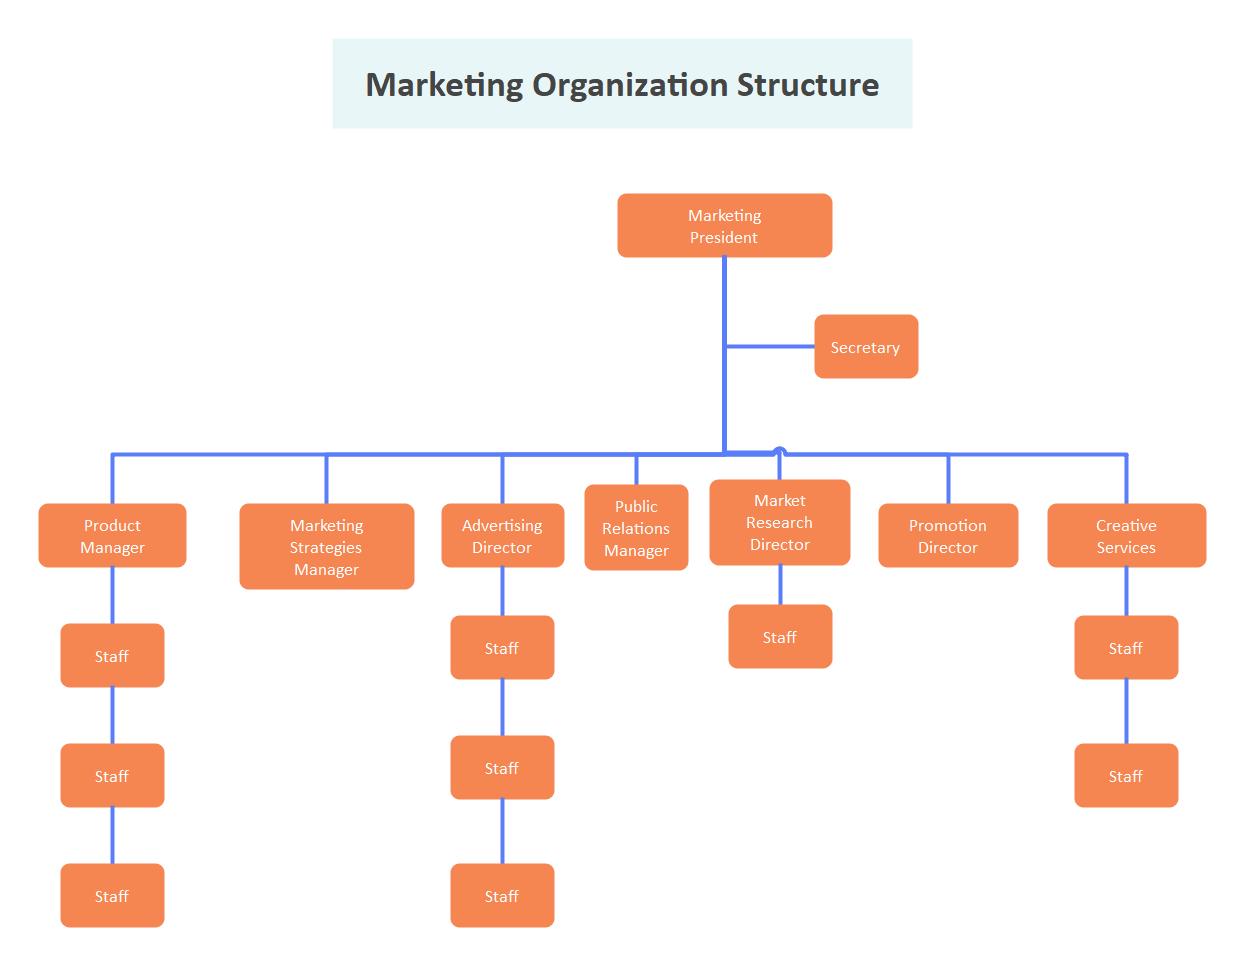 Marketing Organization Structure Template